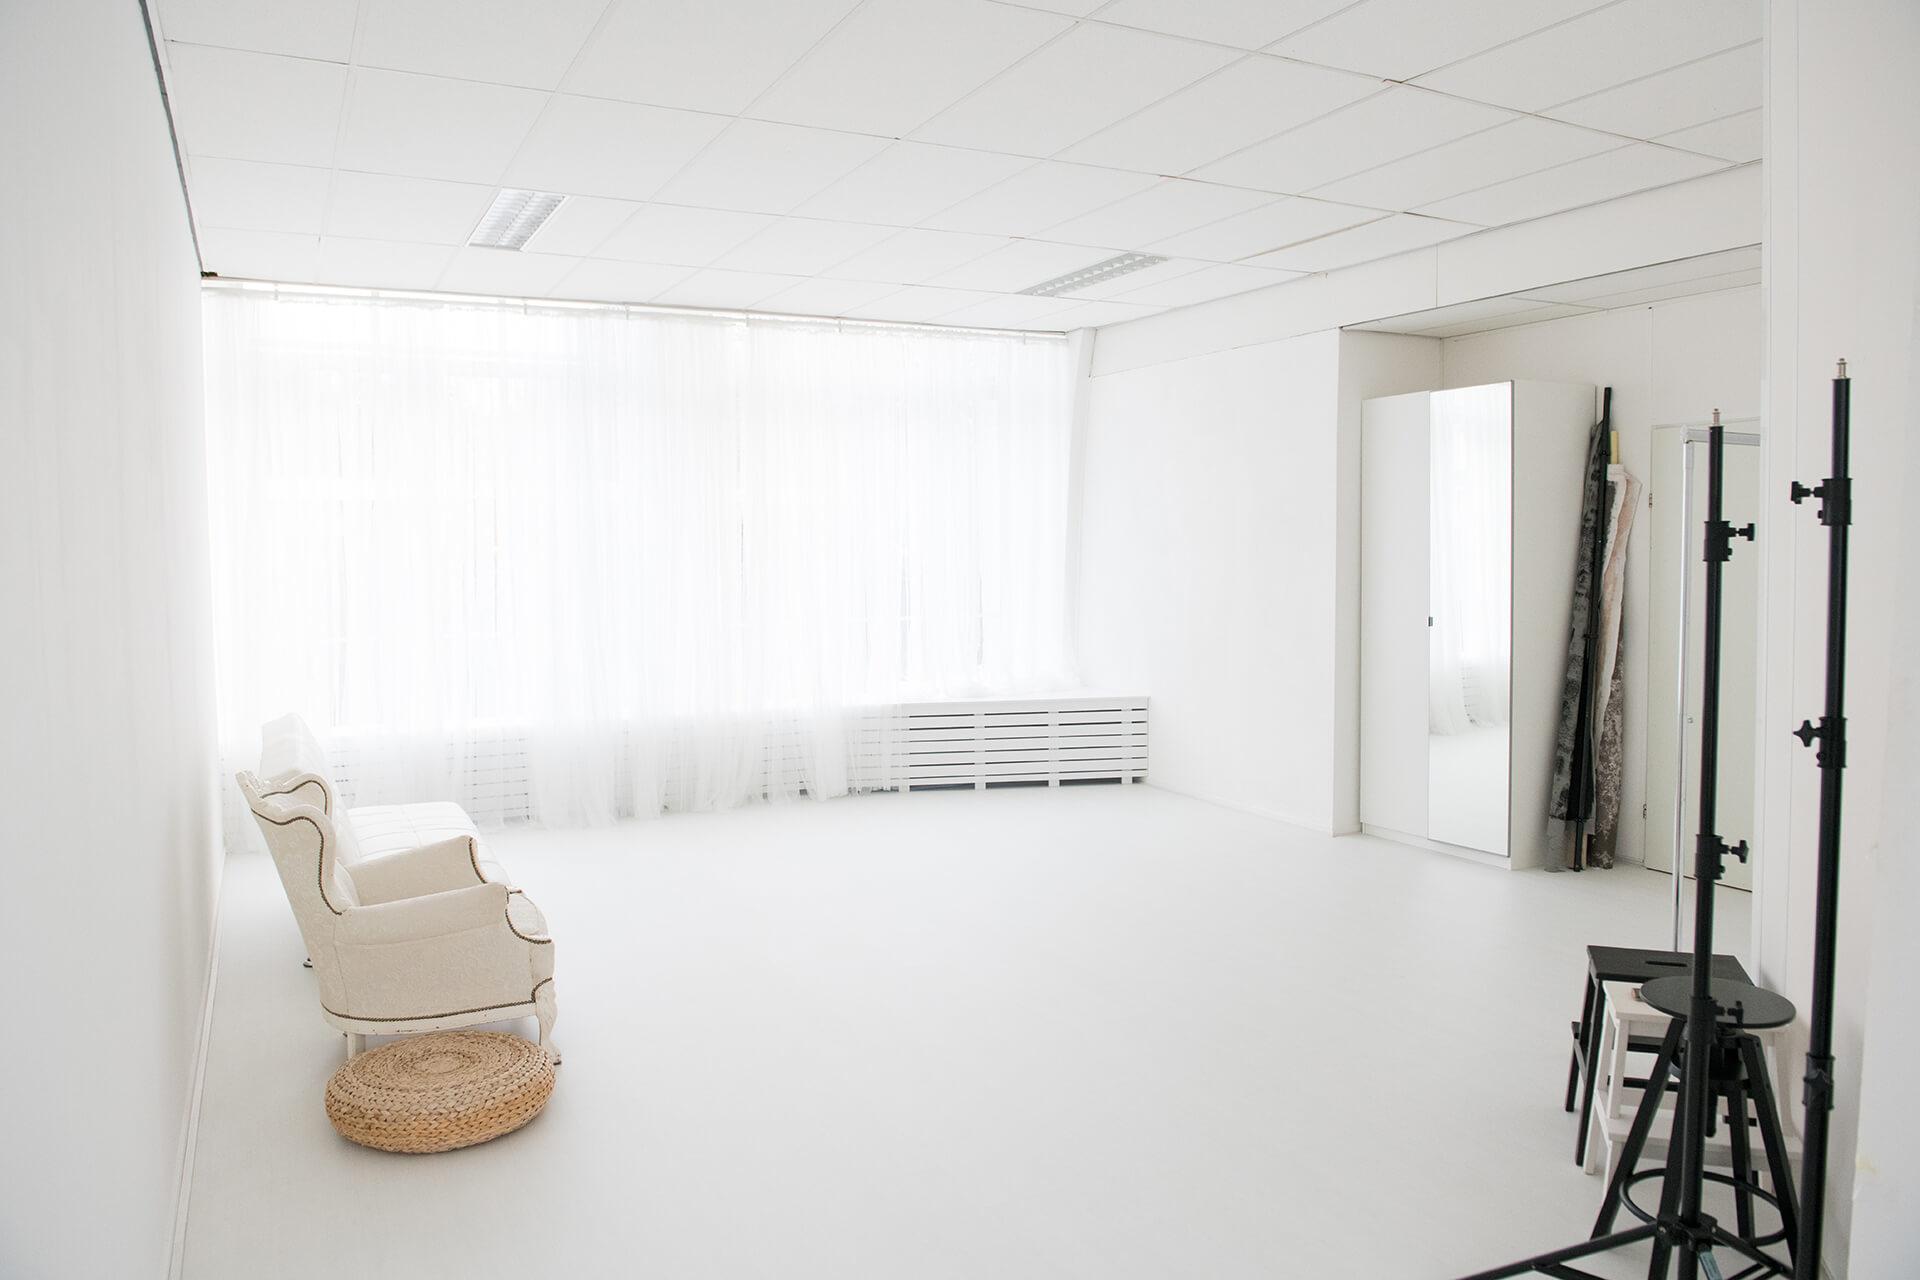 Boutique studio in Zevenbergen